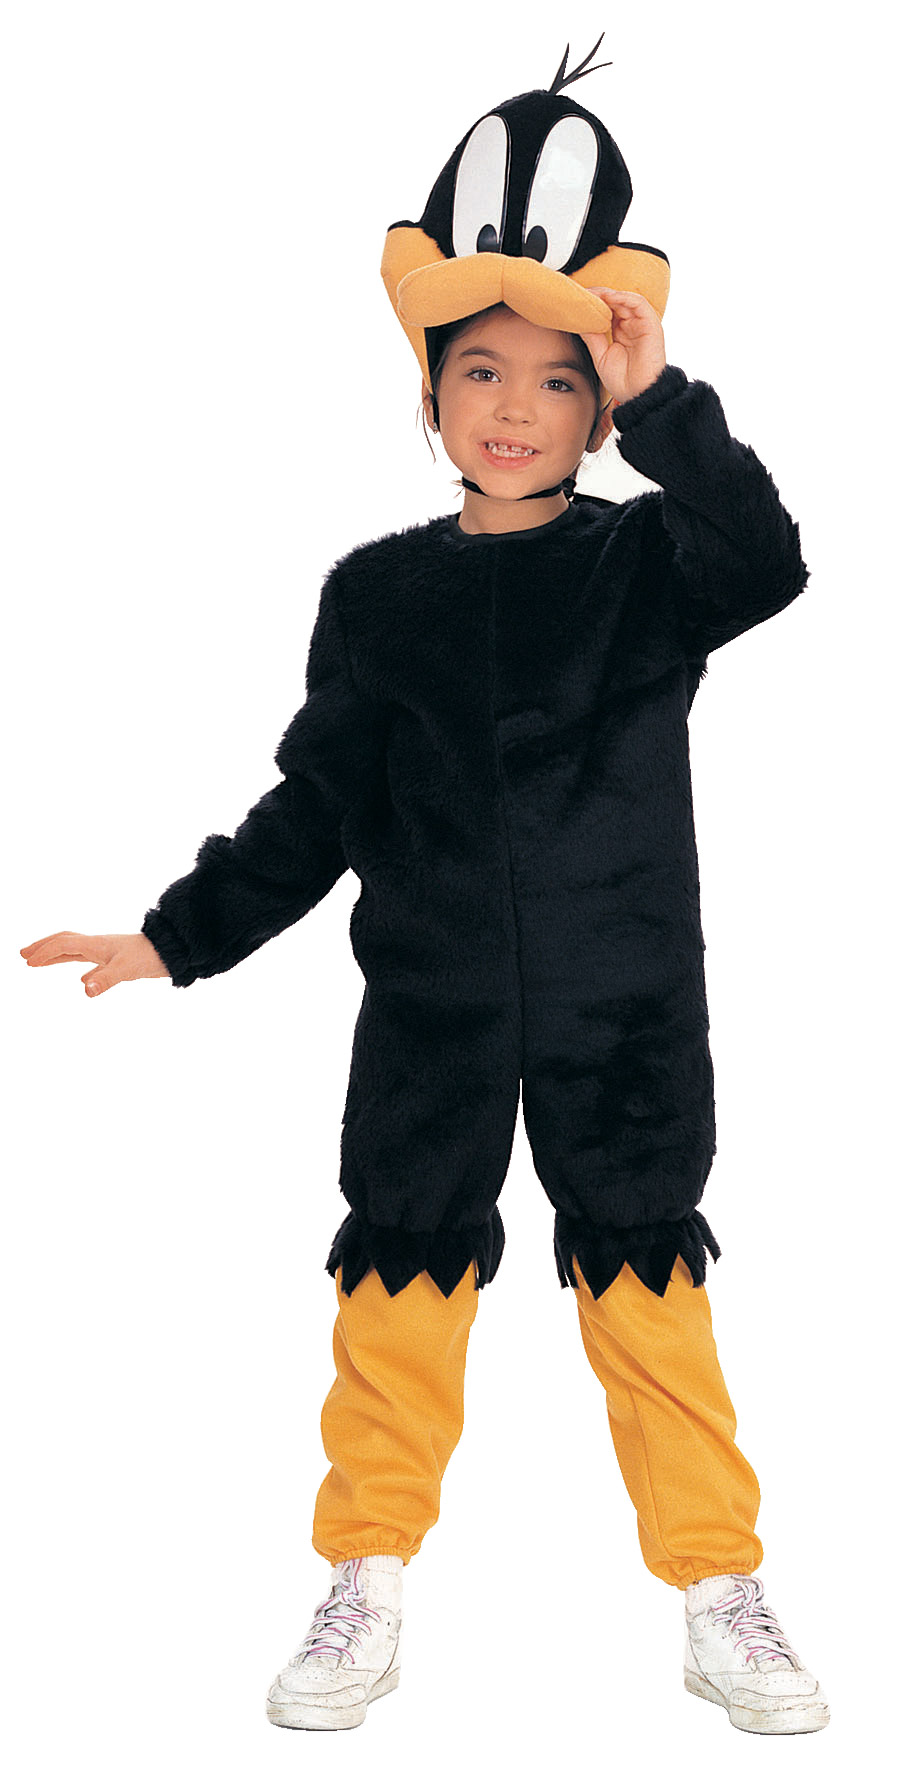 d guisement daffy duck enfant costume canard pas cher. Black Bedroom Furniture Sets. Home Design Ideas